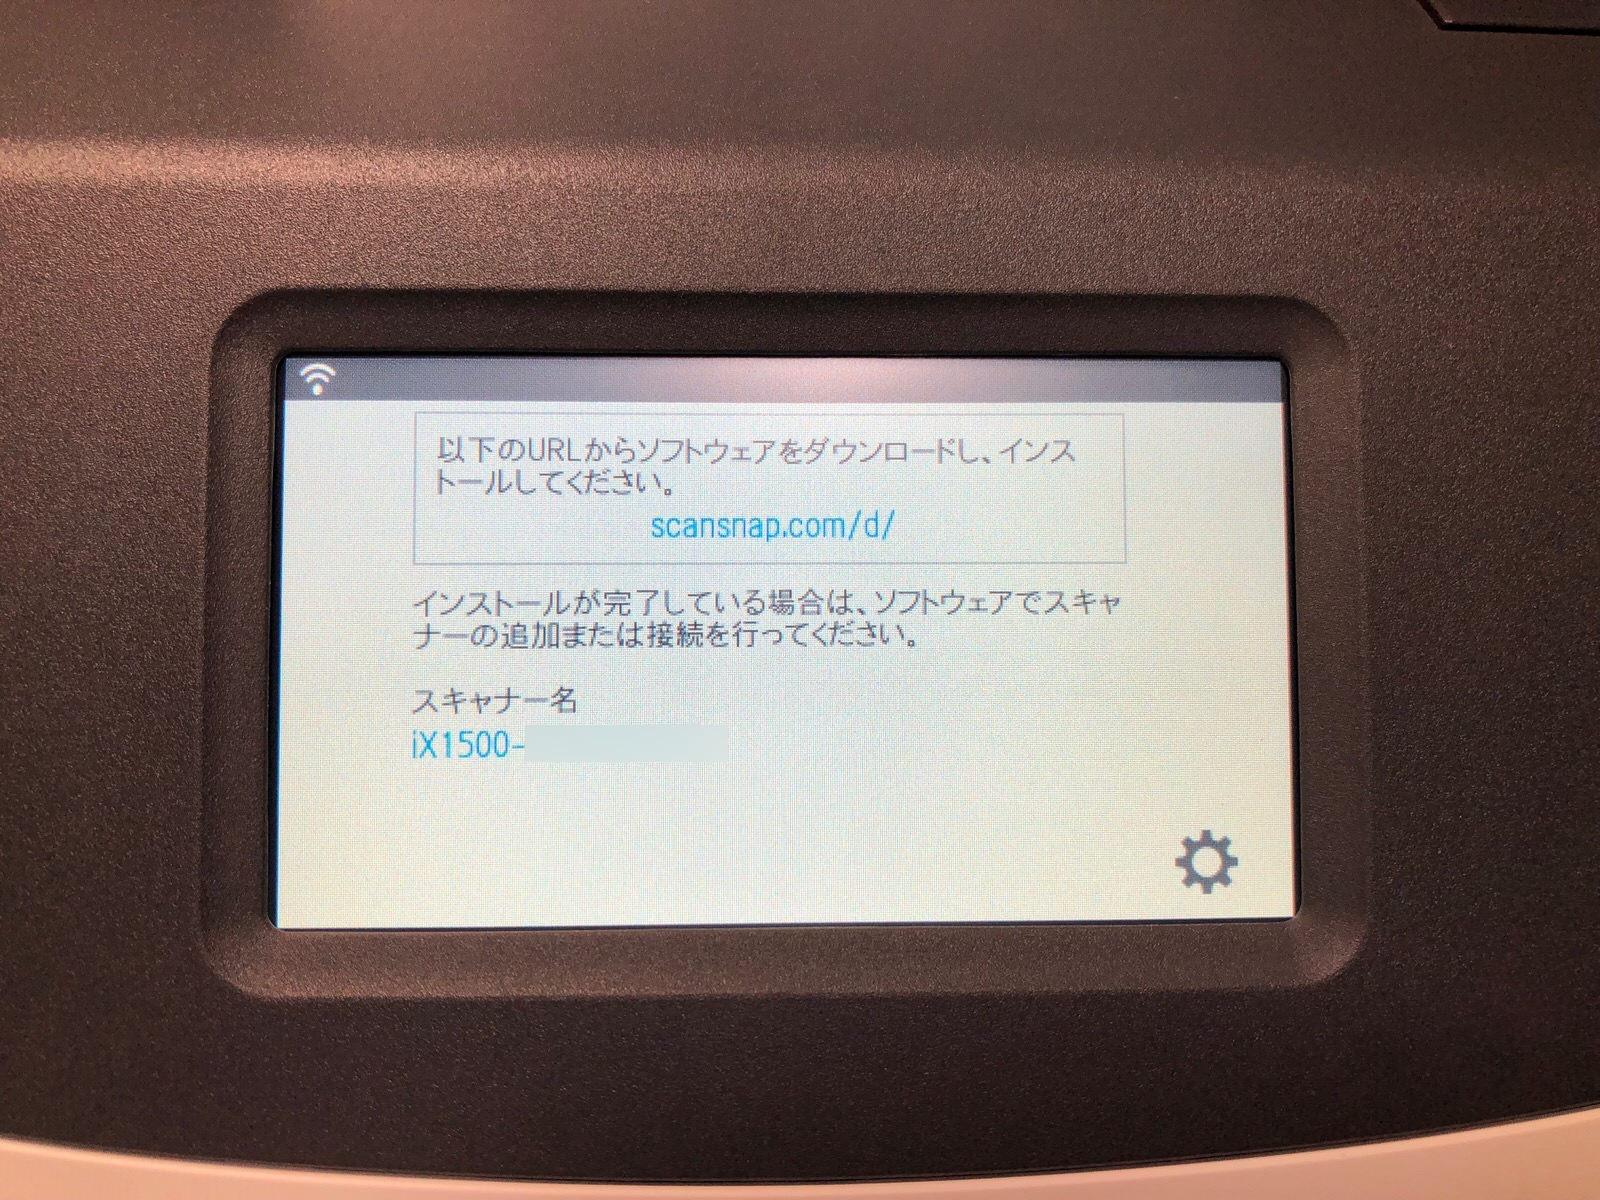 ScanSnap iX1500-20